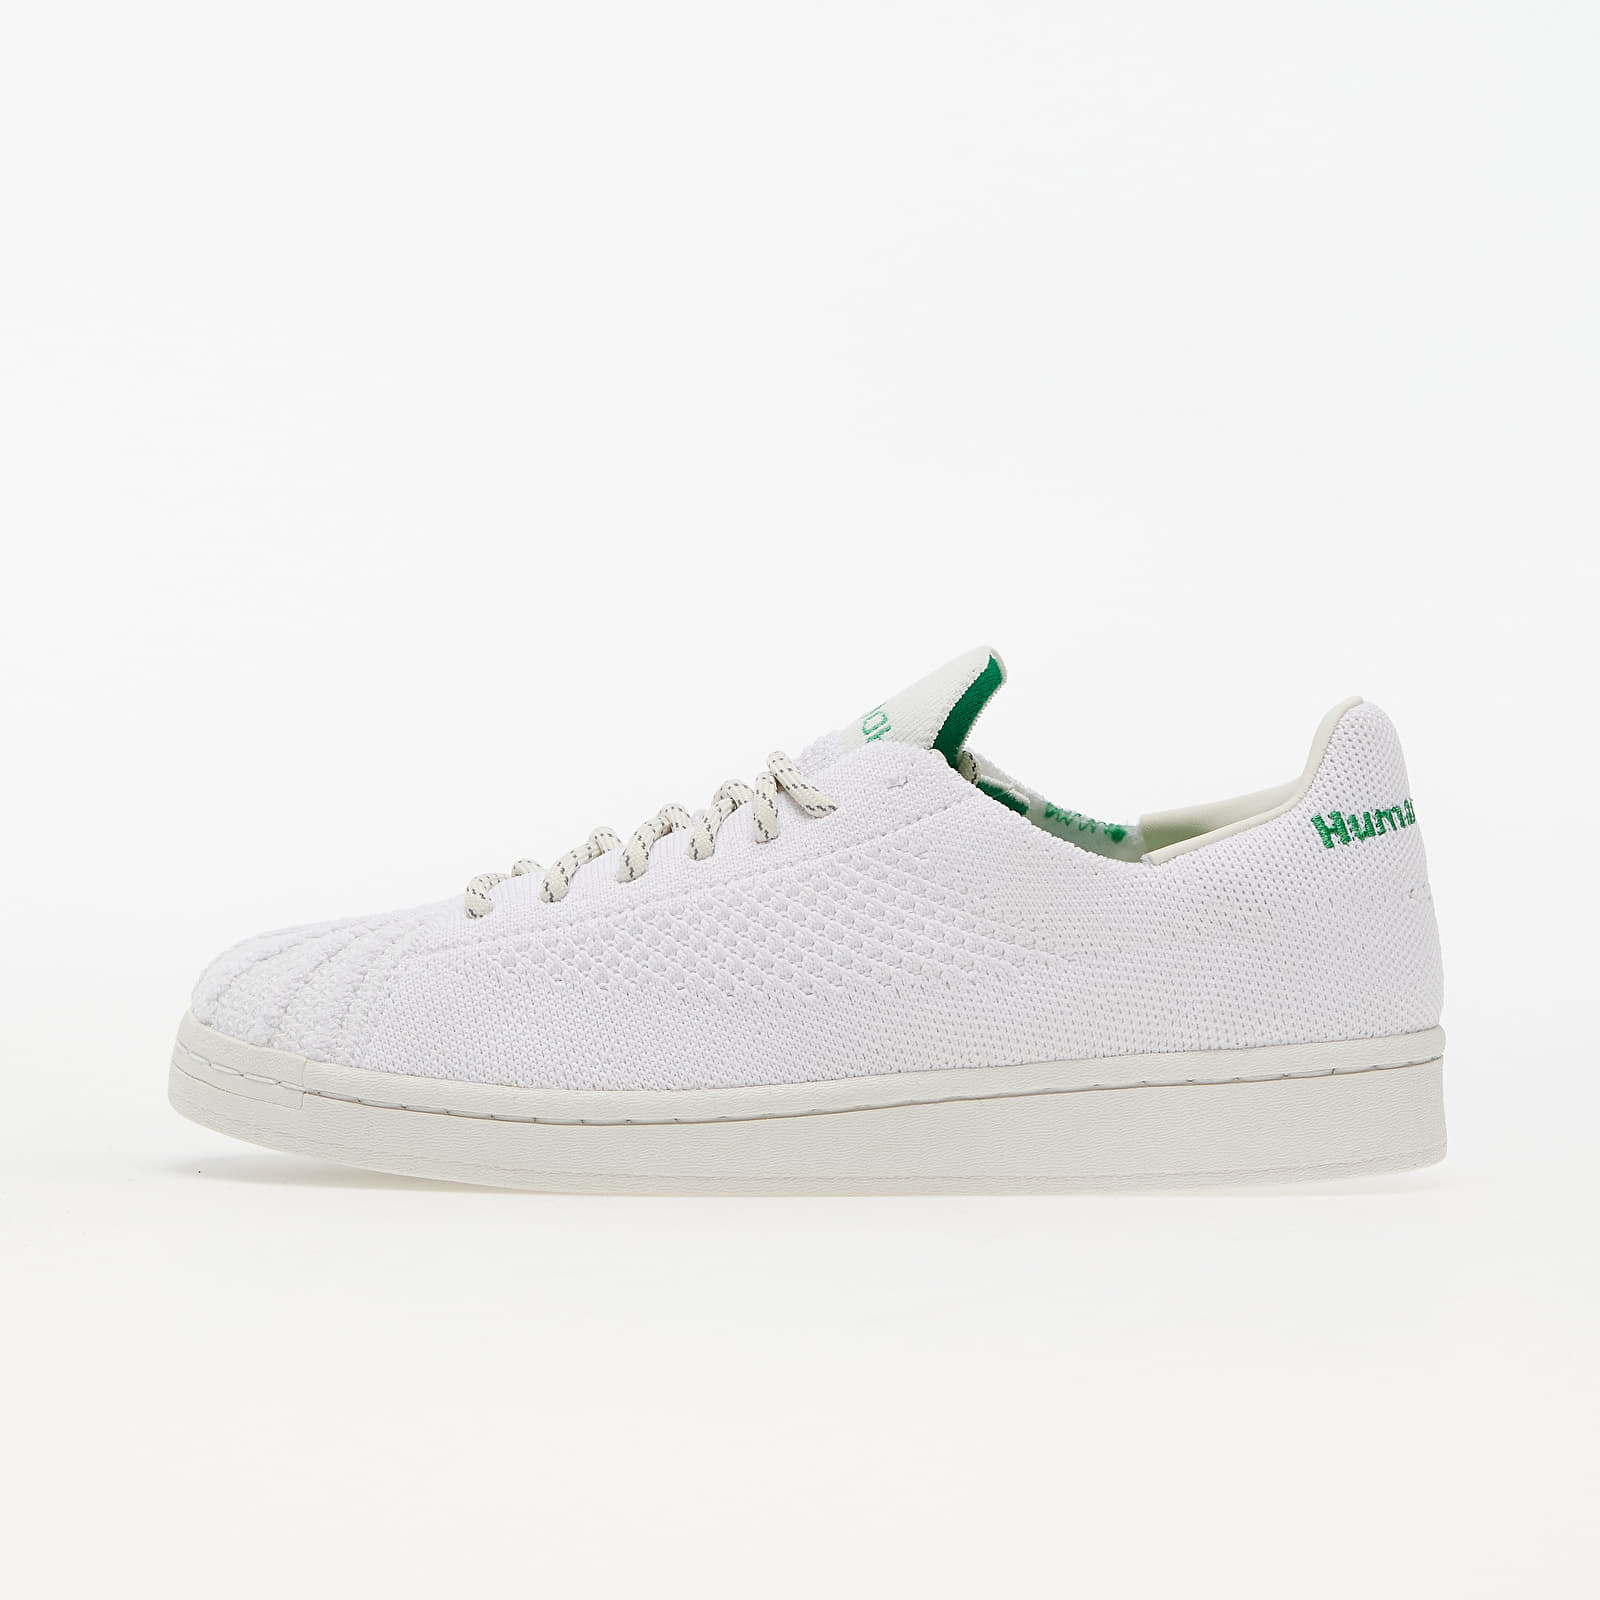 adidas x Pharrell Williams Superstar Primeknit Core White/ Core White/ Vivid Green EUR 42 2/3